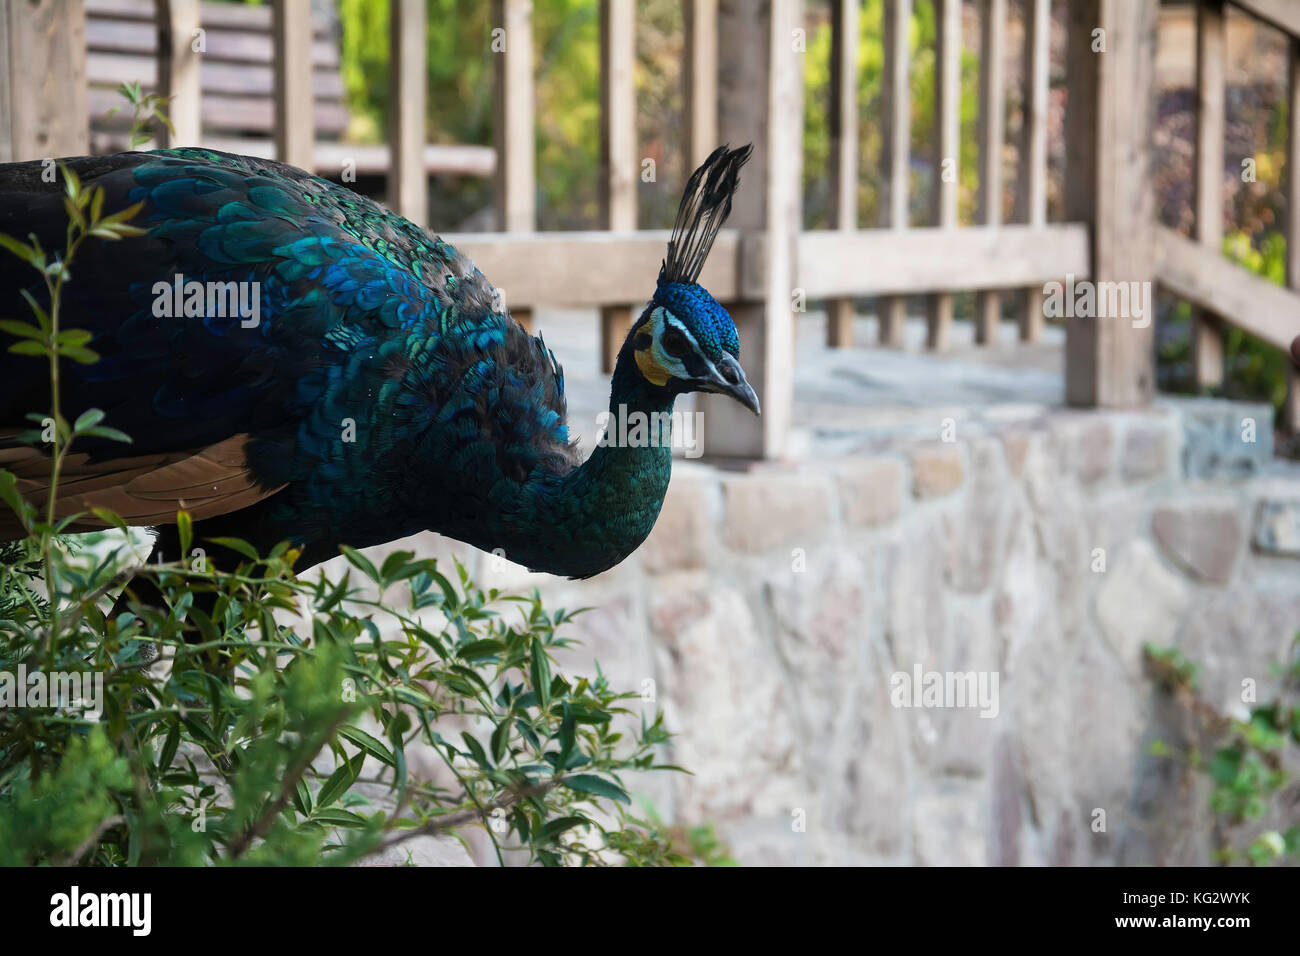 Peacock at Birds Park in Tehran City Area. - Stock Image